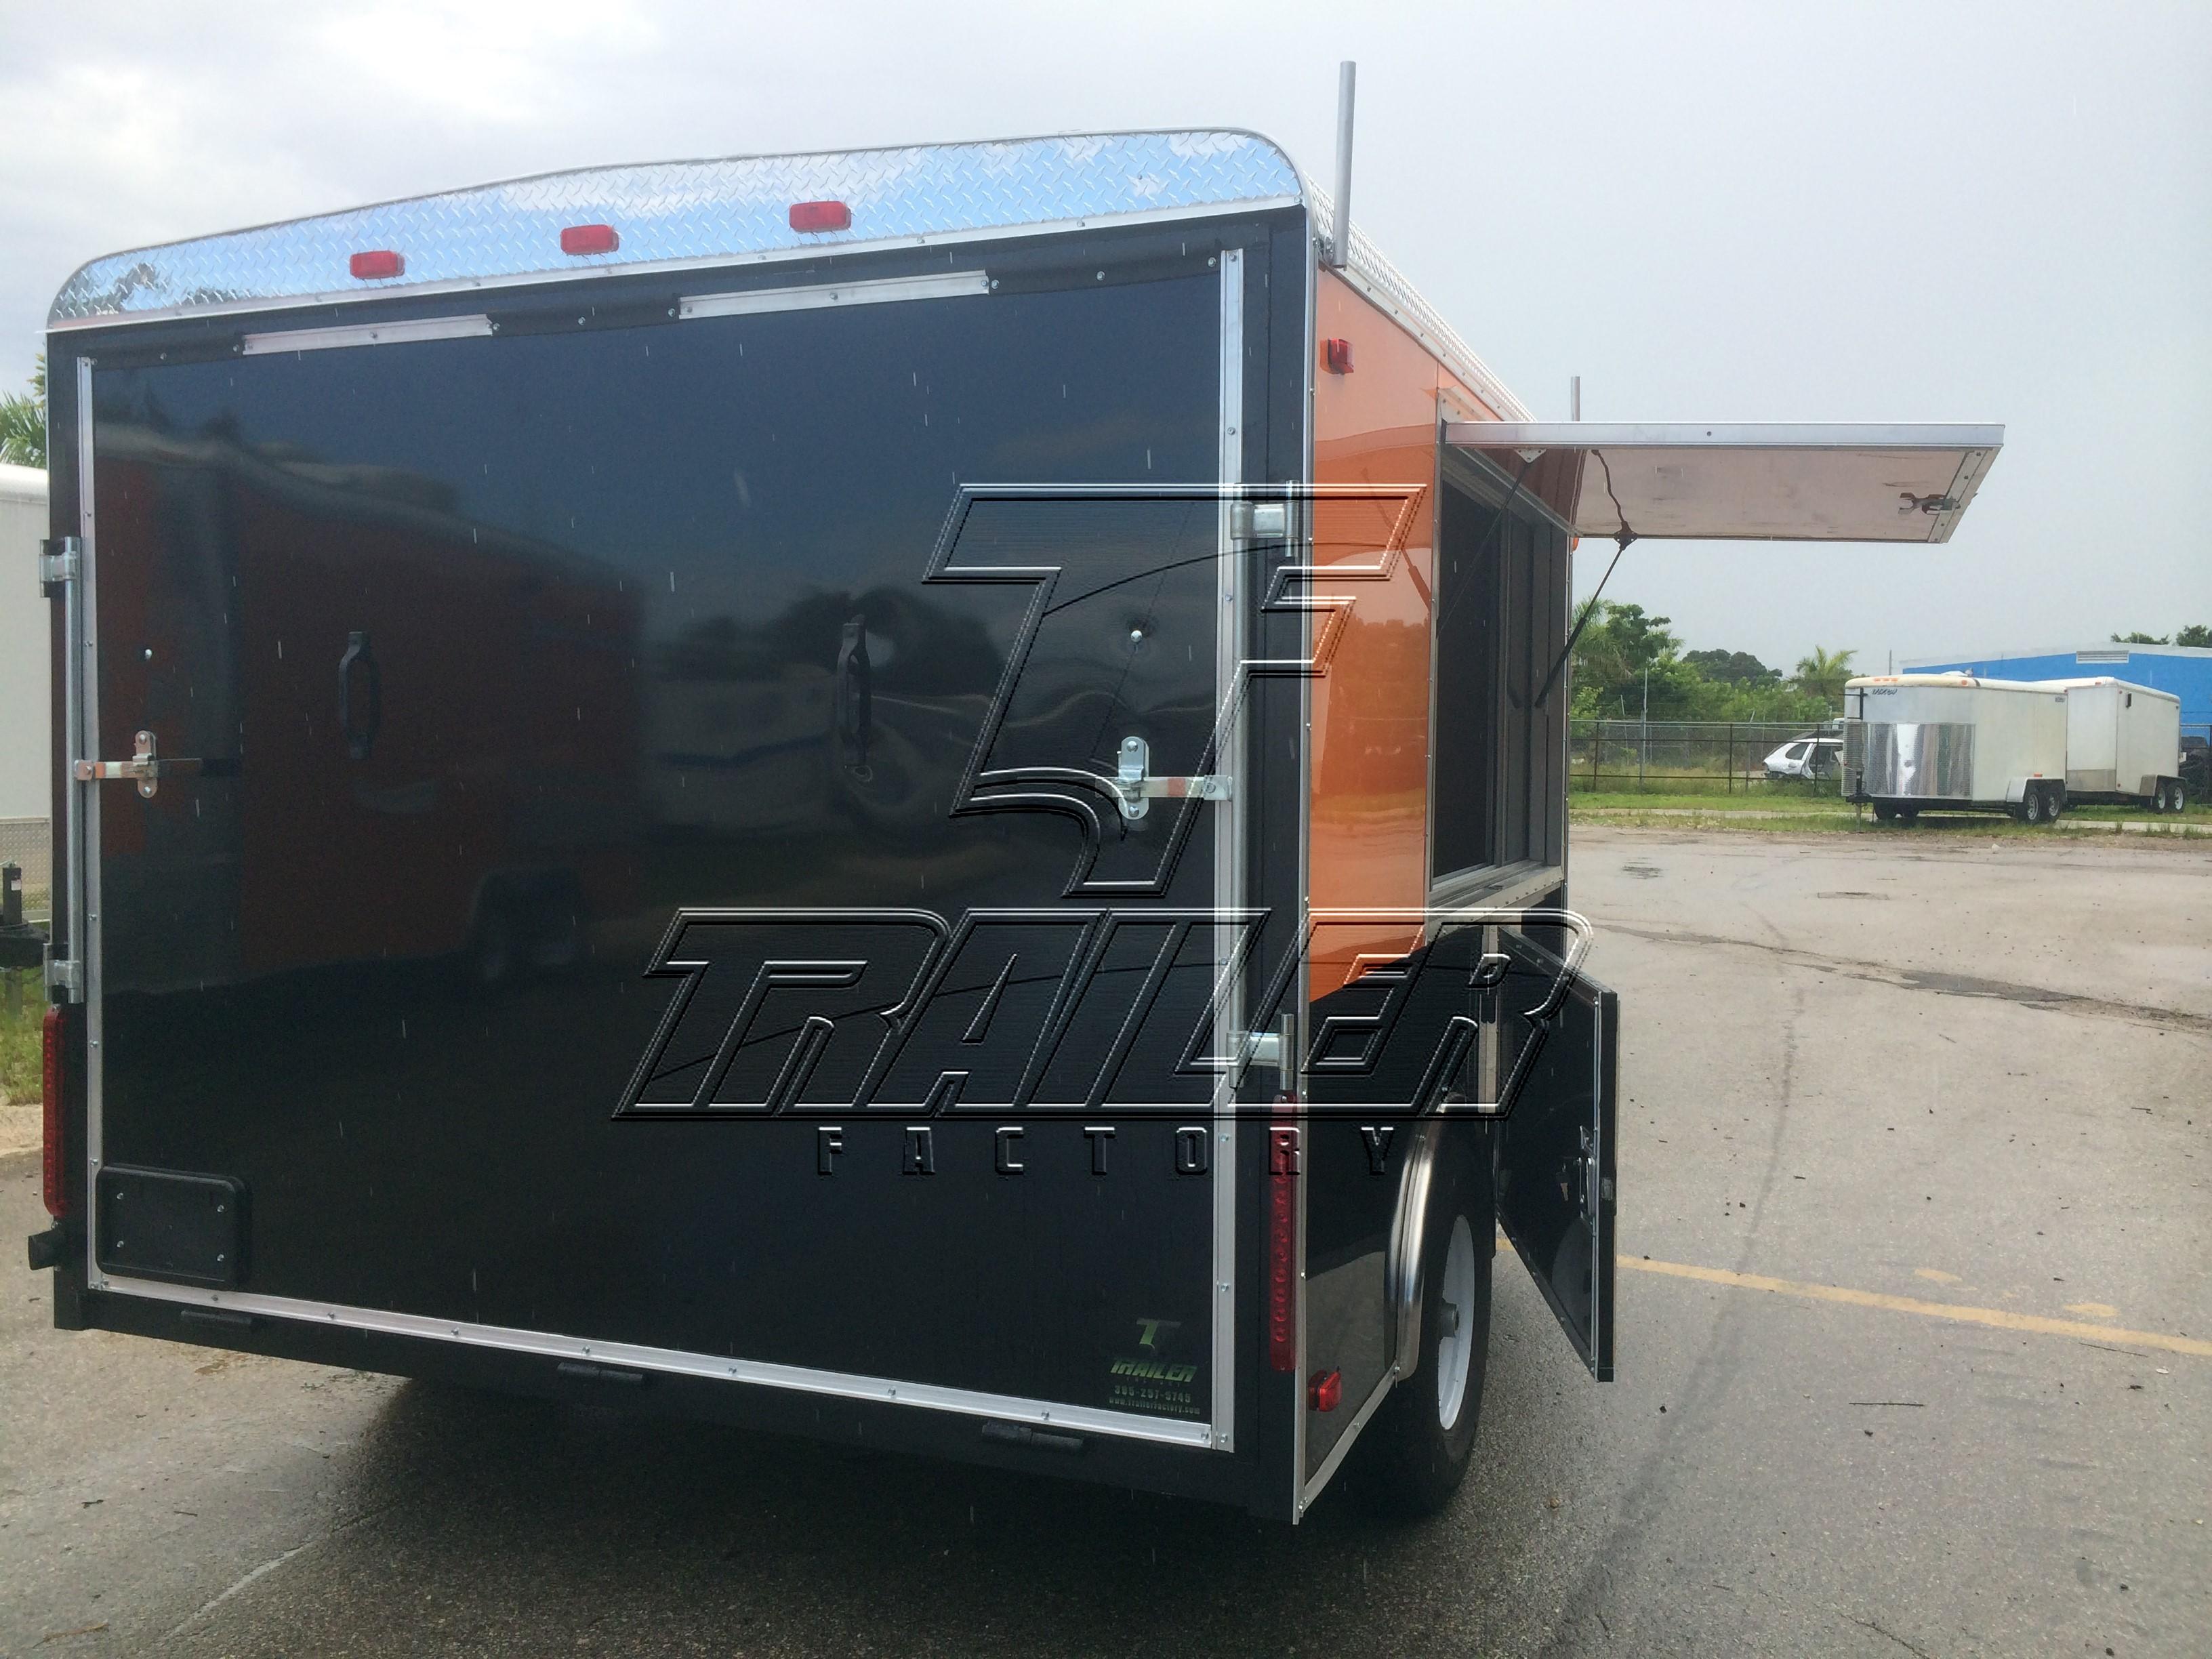 8 6x18 Tandem Axle Merchandiser Trailer Trailer Factory